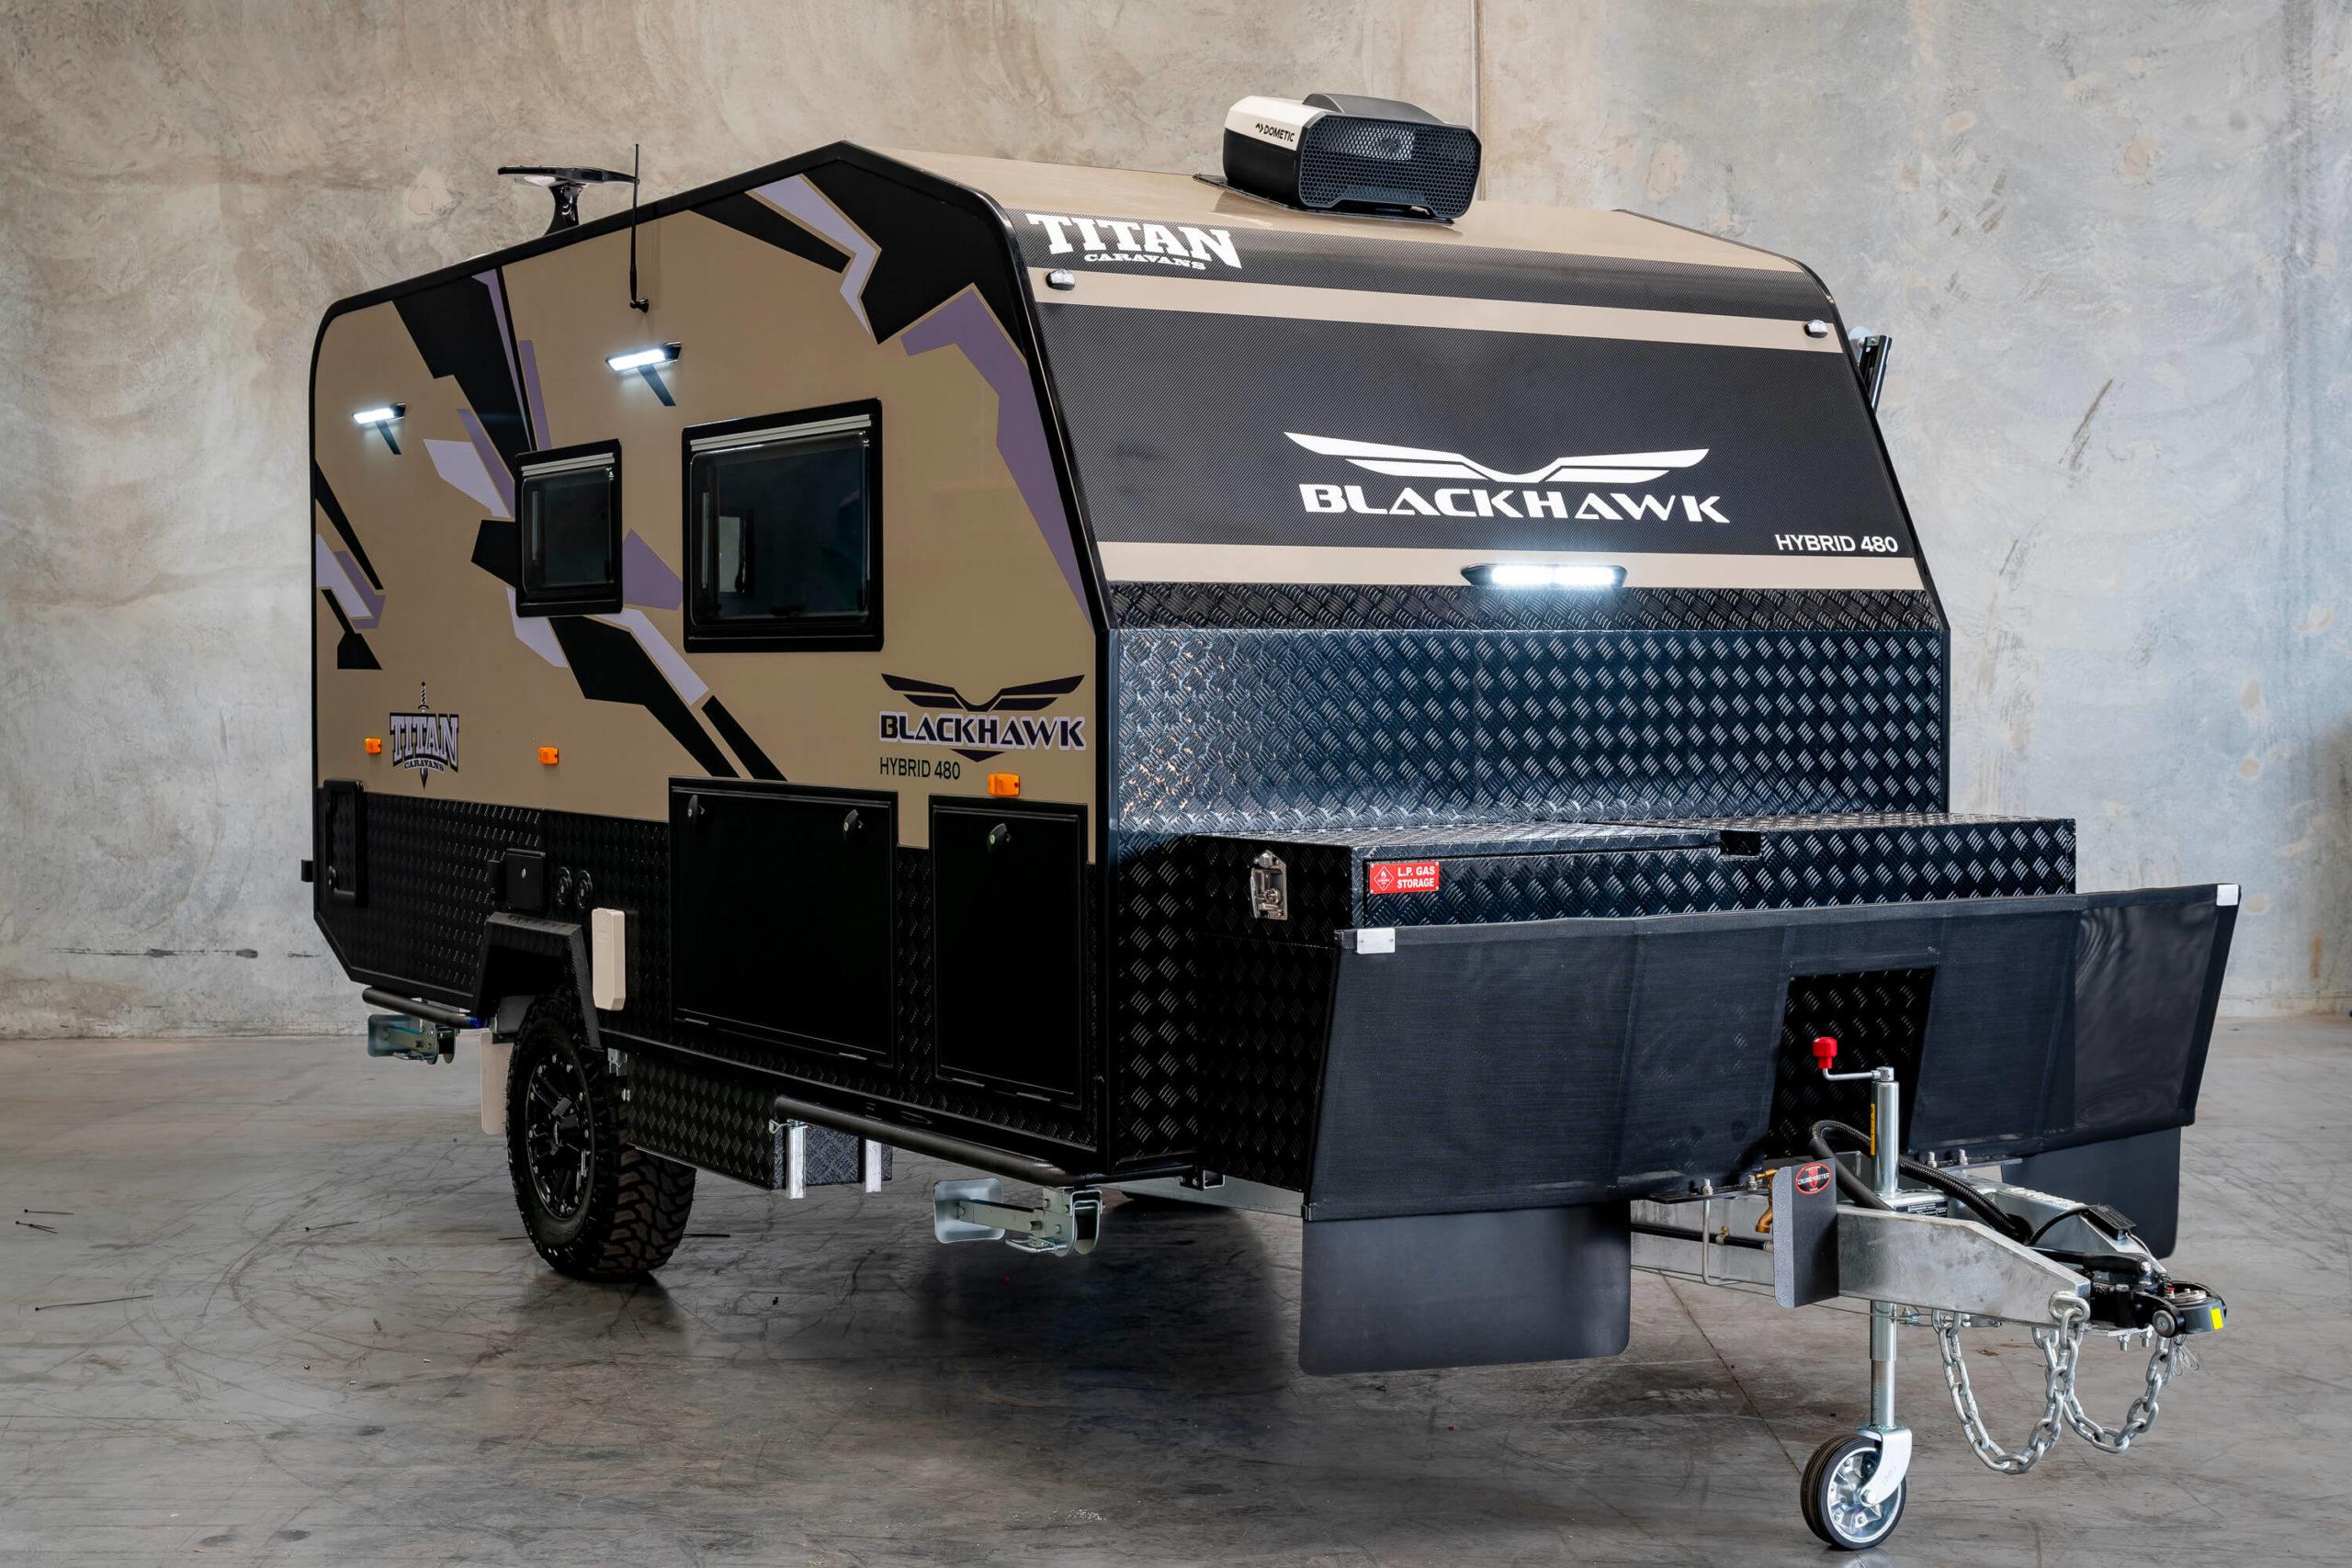 Titan-480-blackhawk-caravan